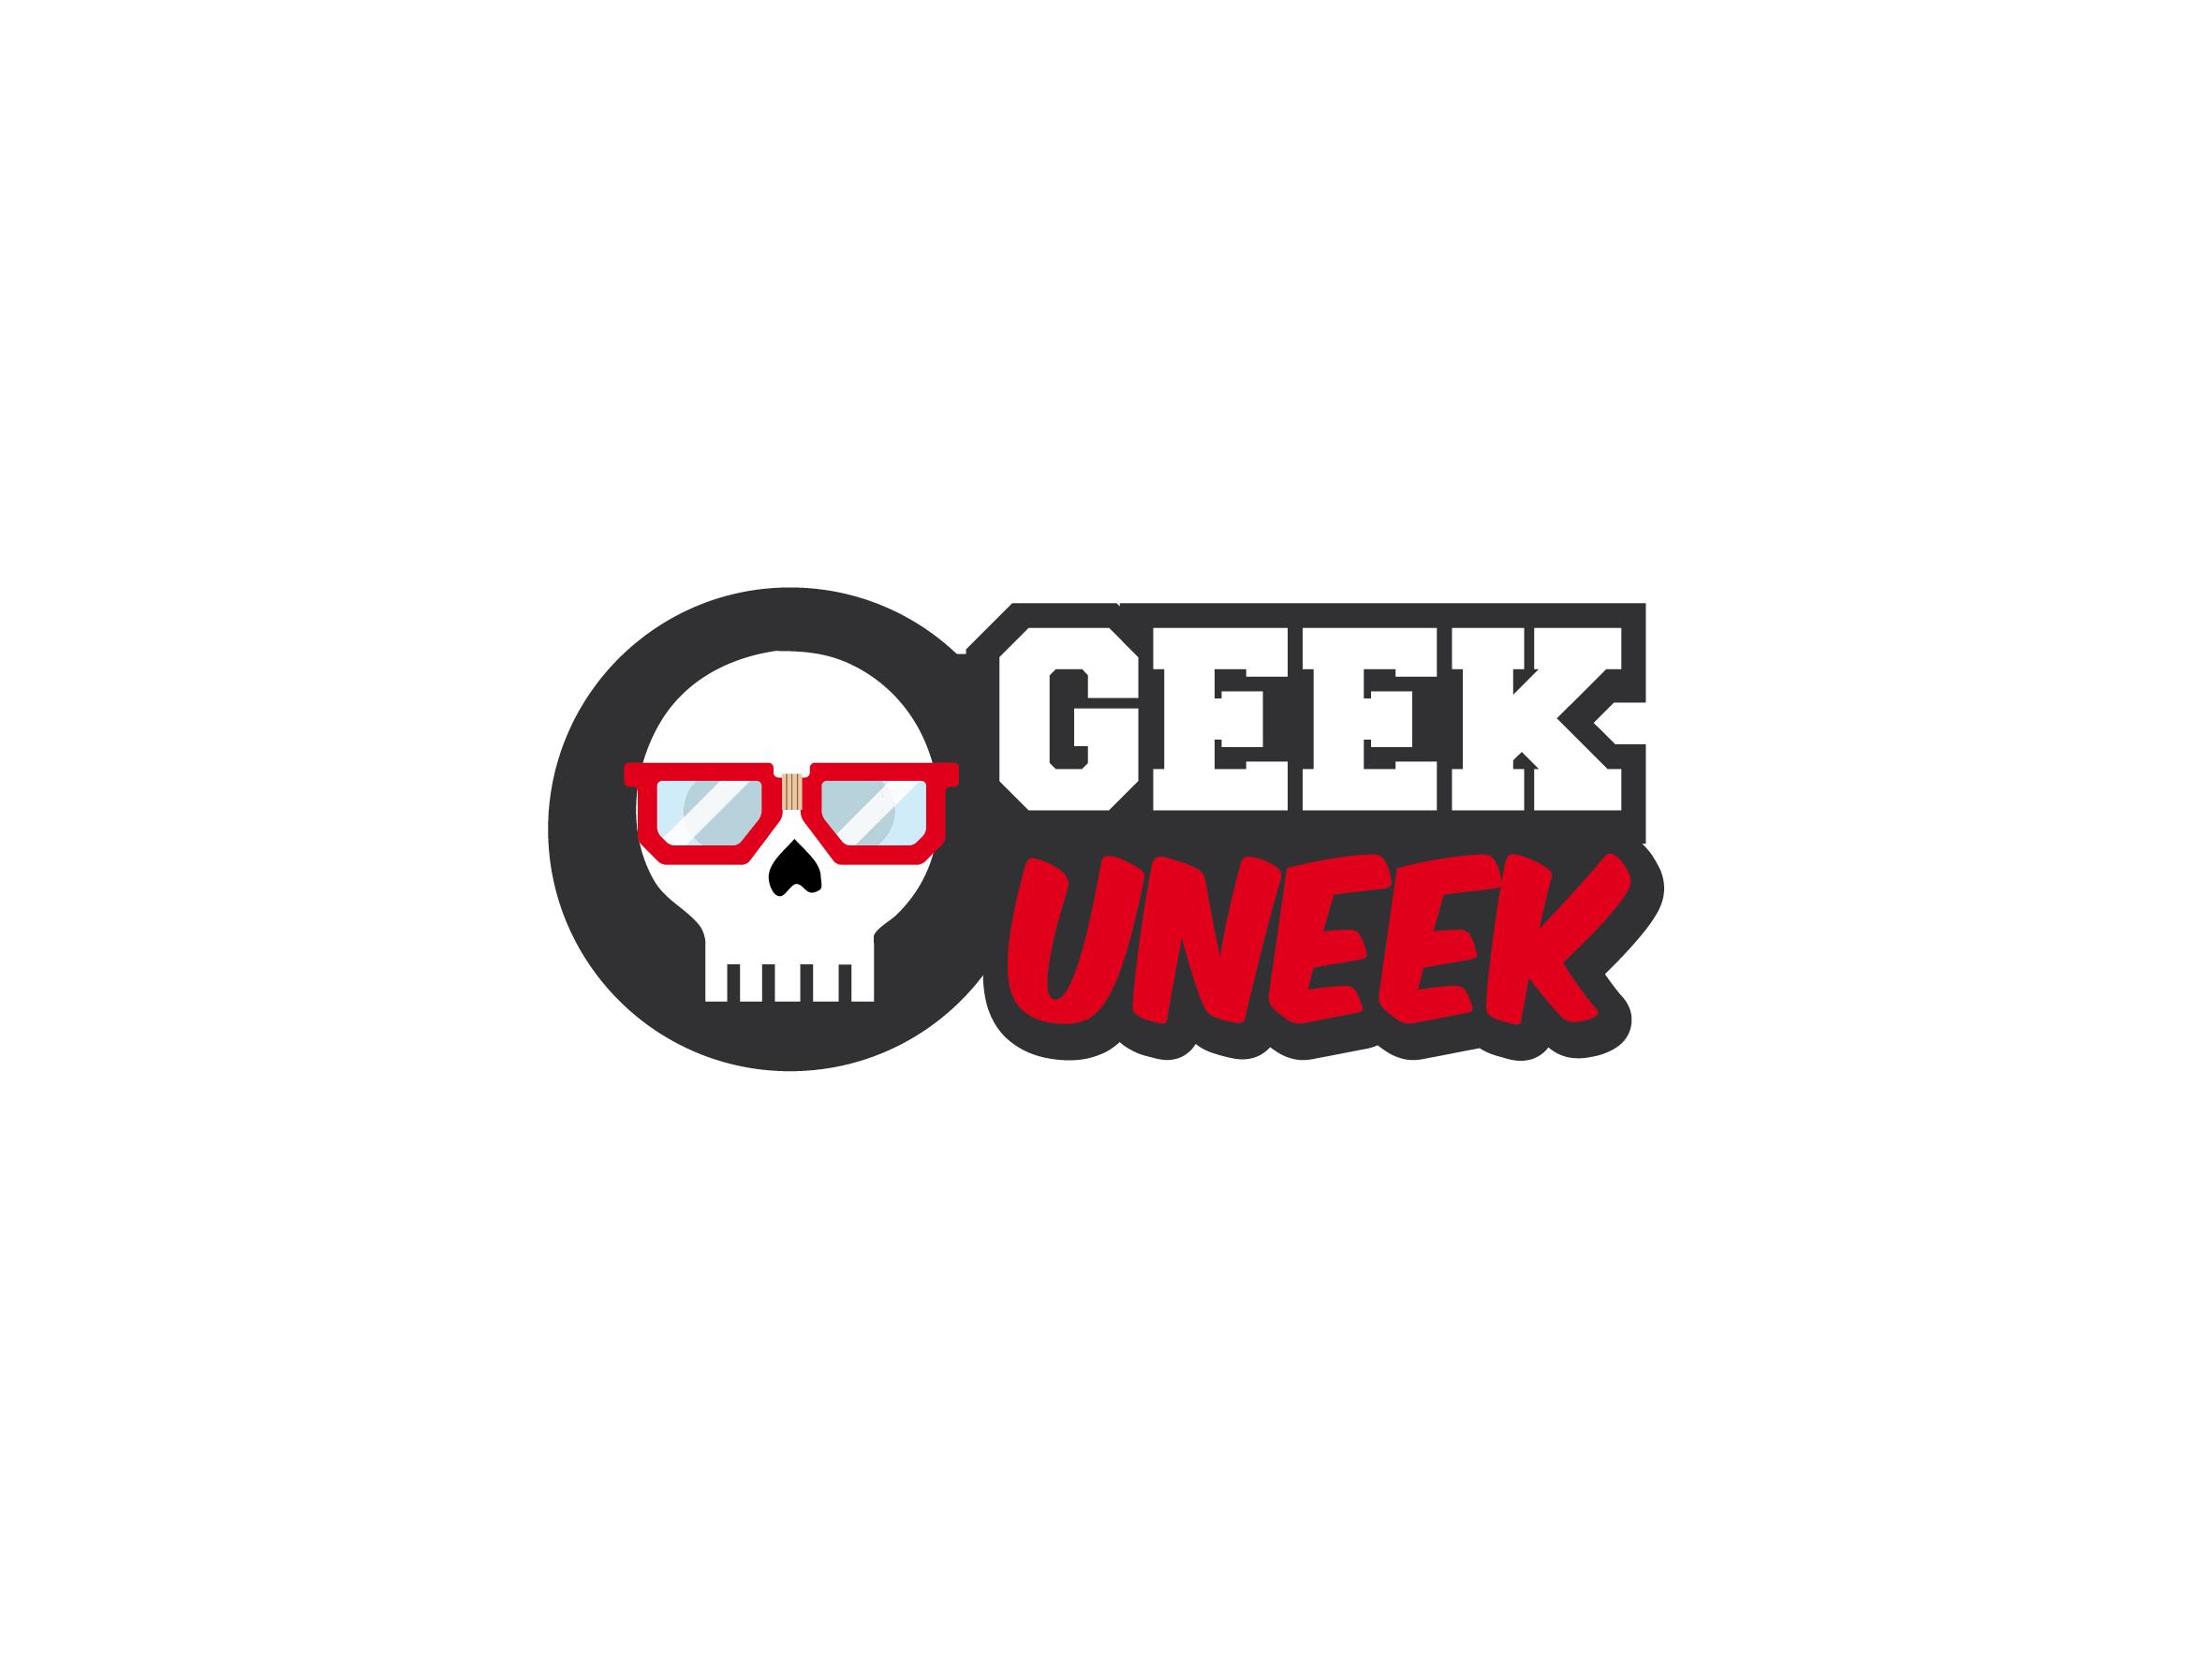 geek uneek skipton shop logo design designed by Dakini Design Saltaire, Shipley, Bradford